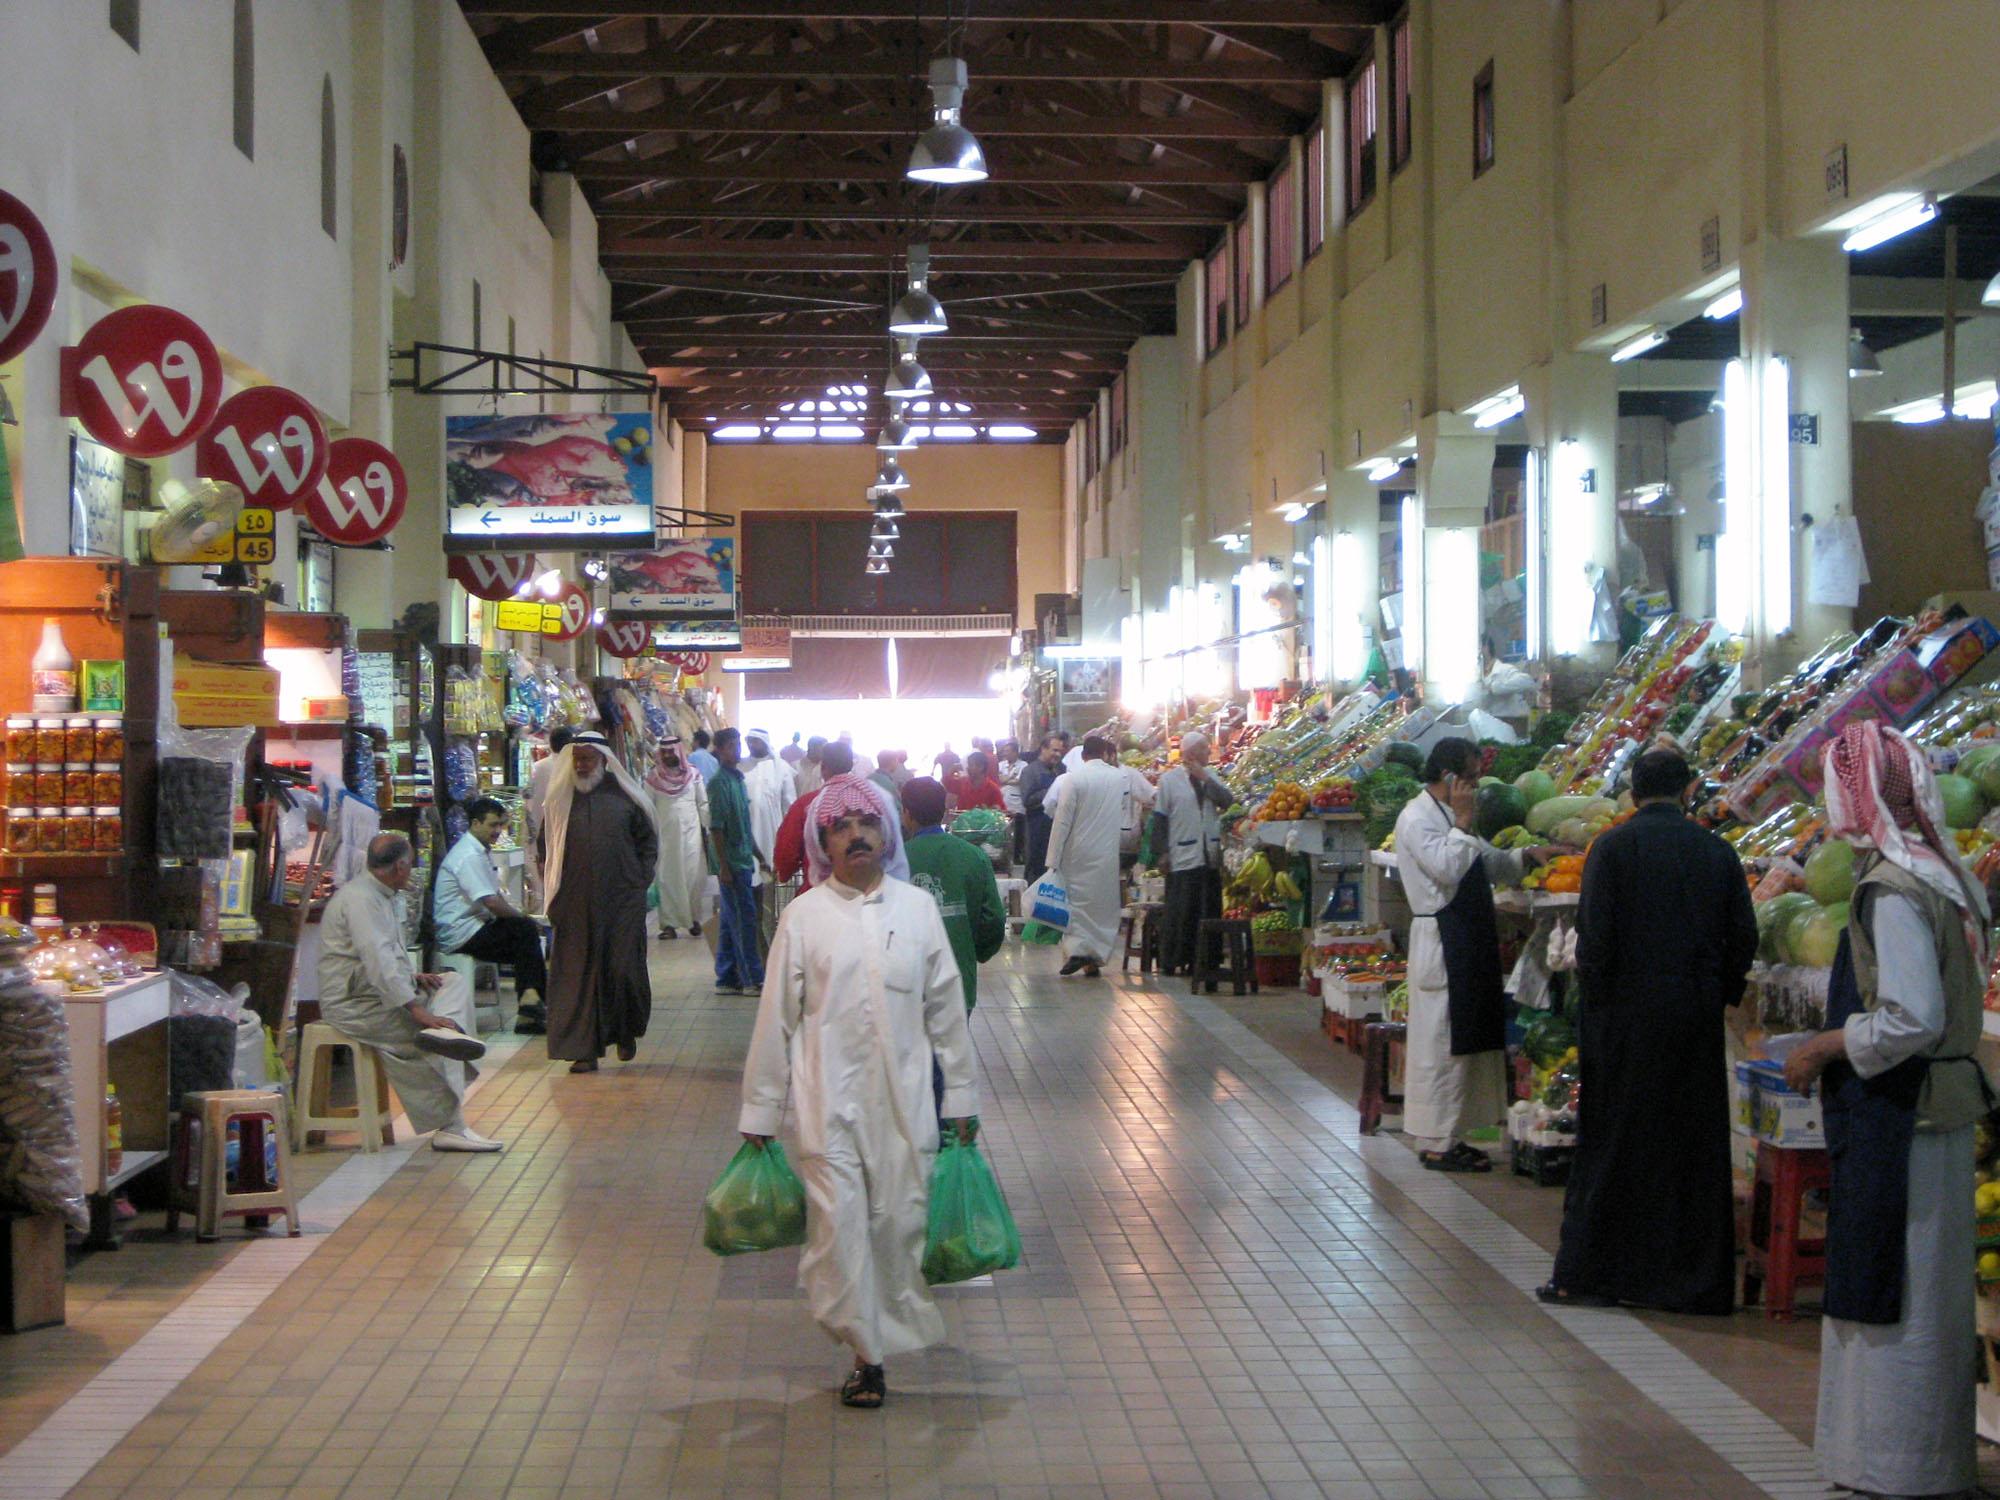 gulf-consult-Kuwait-City-Urban-Development-2030-9